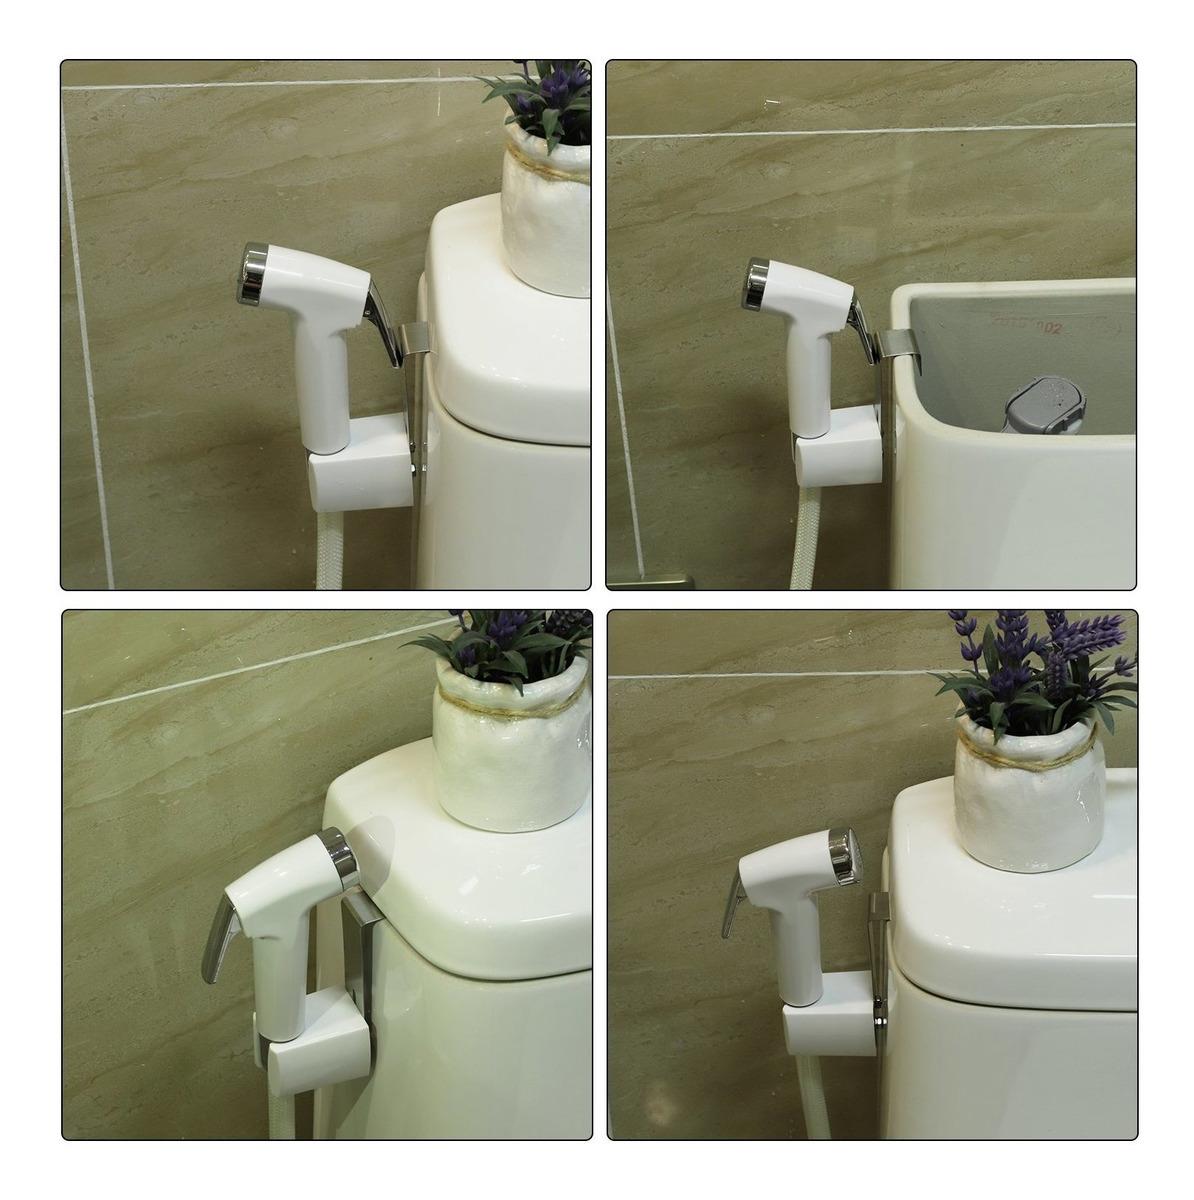 Prime Hand Held Bidet Sprayer Bathroom Toilet Set Cloth Diaper Spr Inzonedesignstudio Interior Chair Design Inzonedesignstudiocom